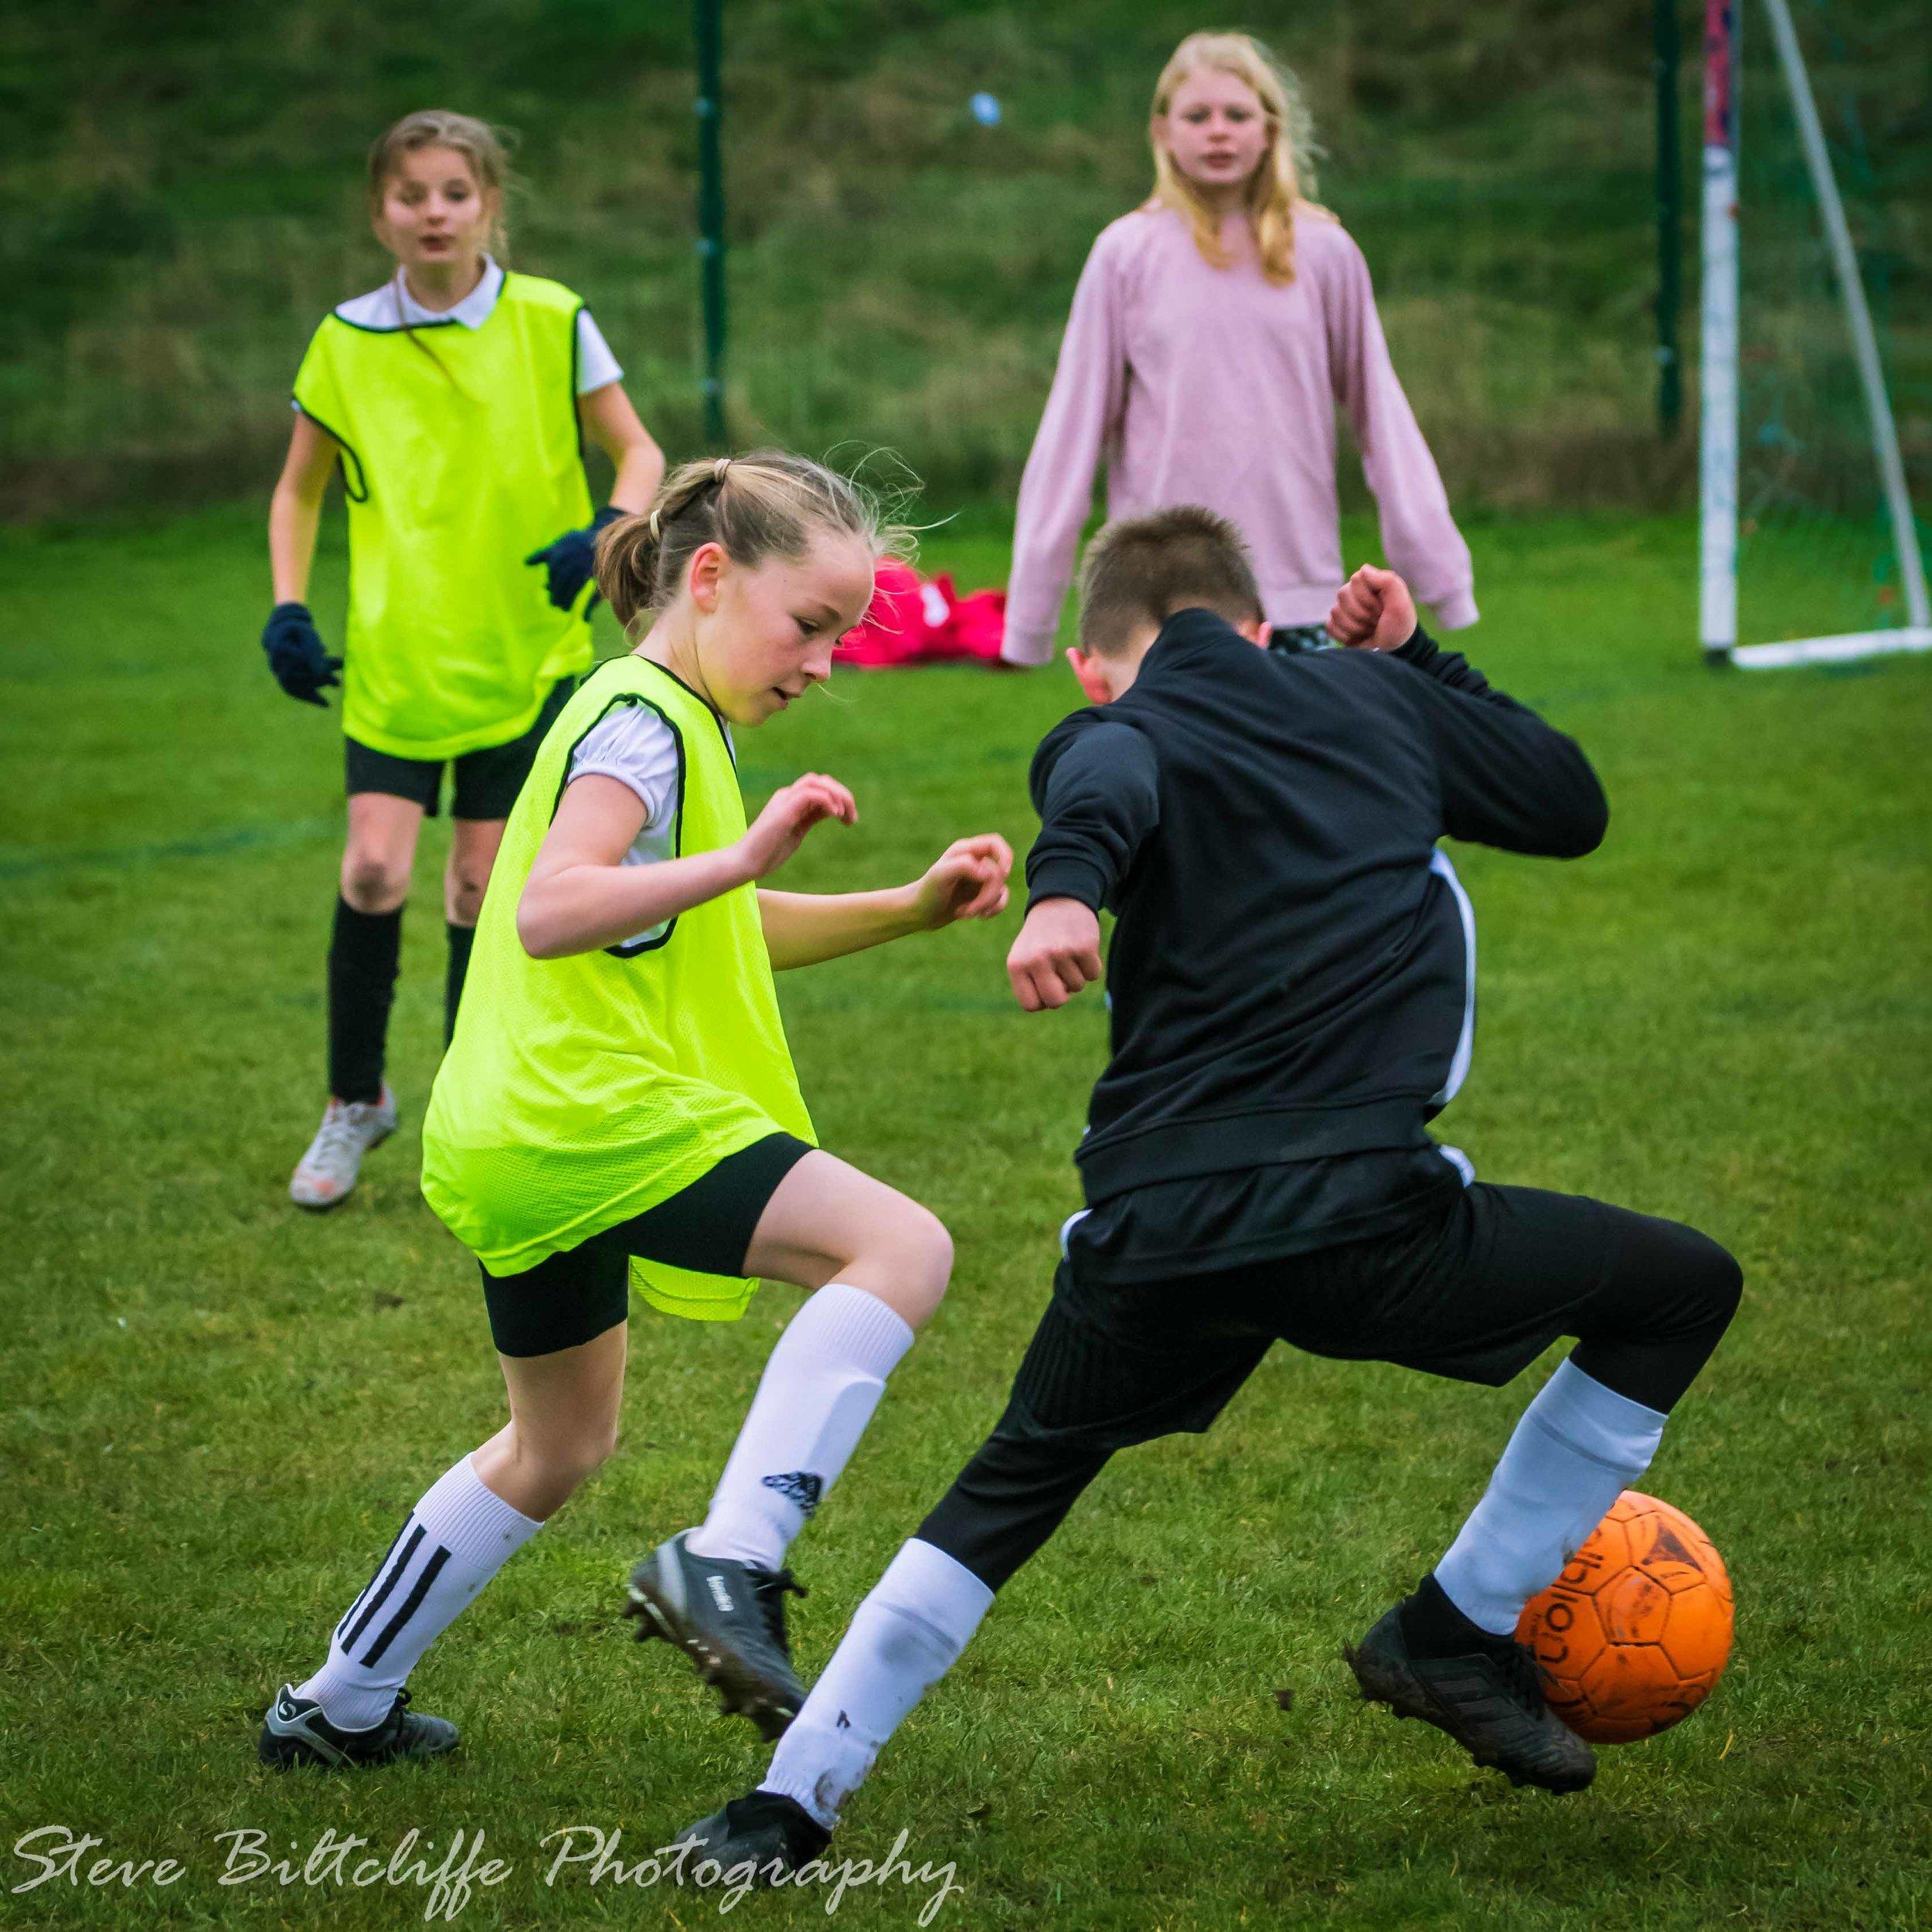 Year 5/6 Football - Wednesday 20th November@ TBC